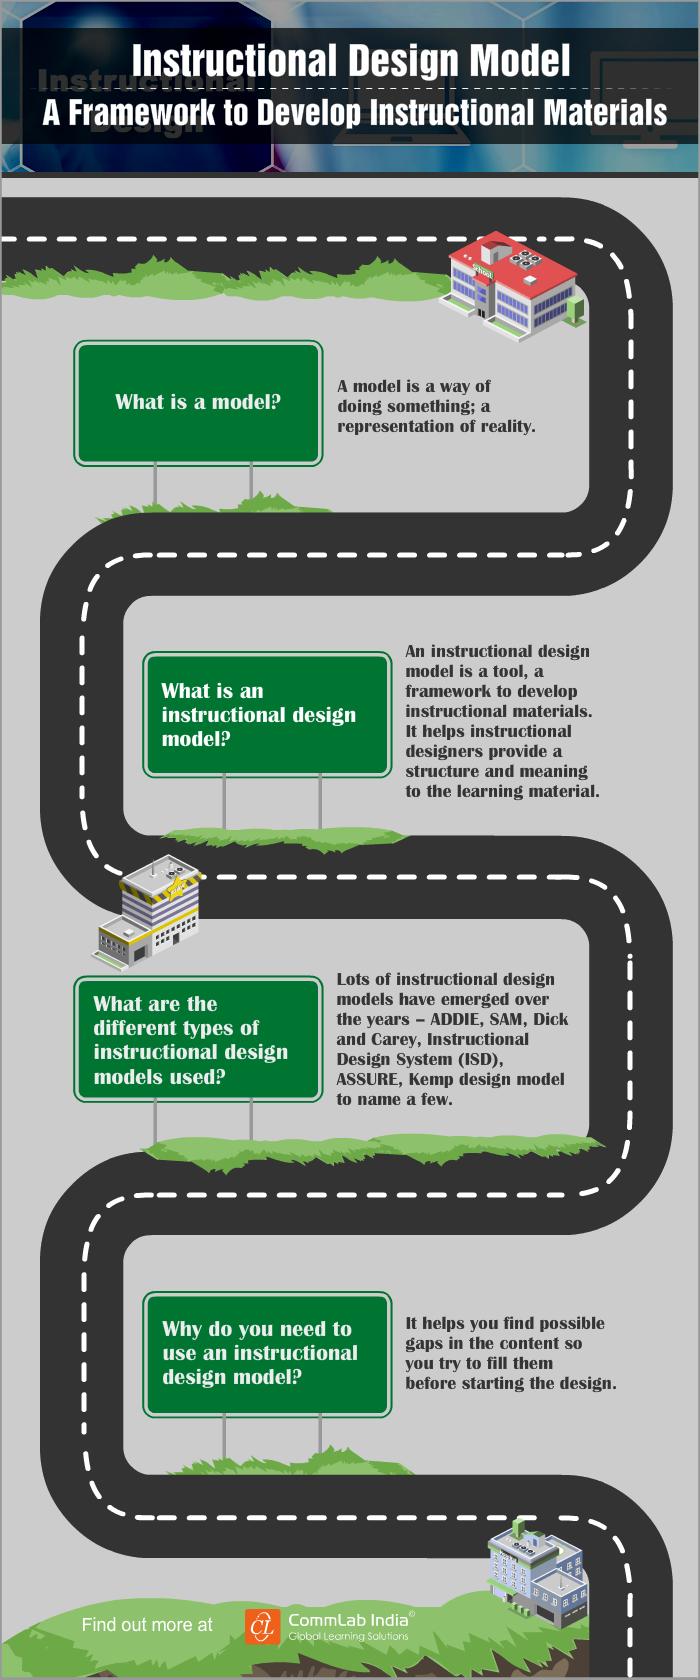 Instructional Design Model A Framework To Develop Instructional Materials Infographic Elearning Design Instructional Design Learning And Development